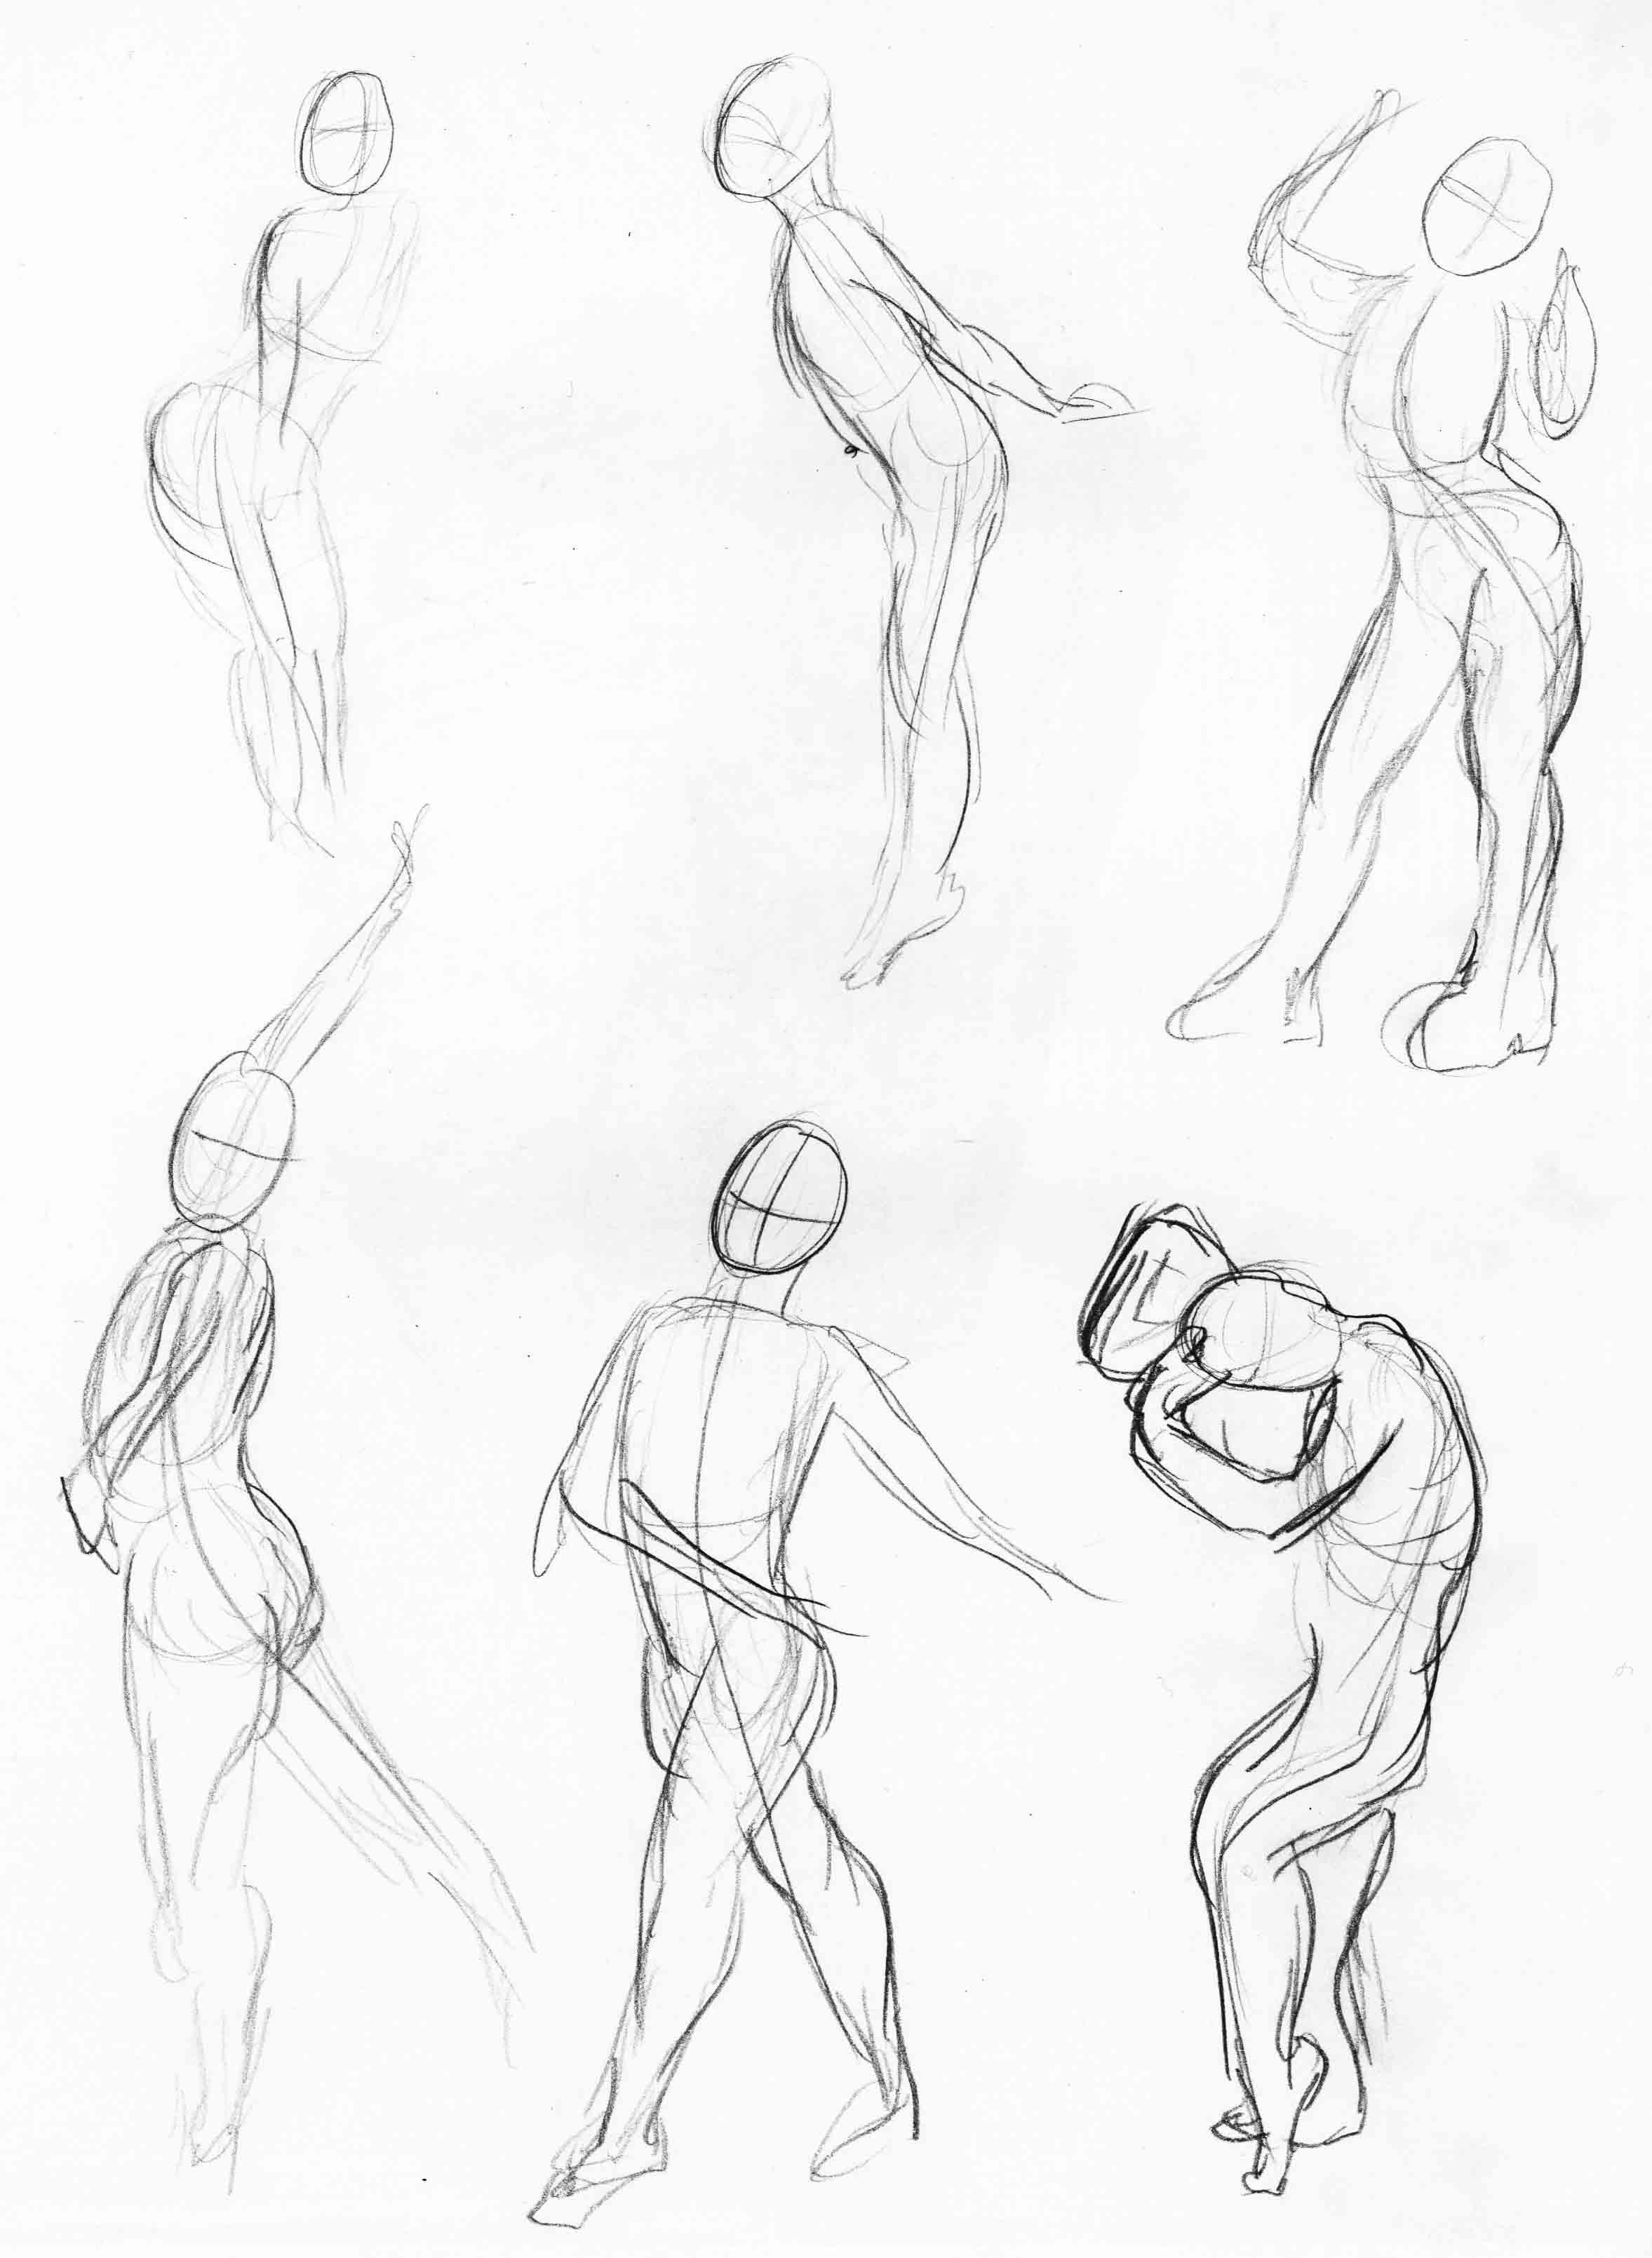 2355x3219 Gesture Drawings Dream Of The Scribble Fiend